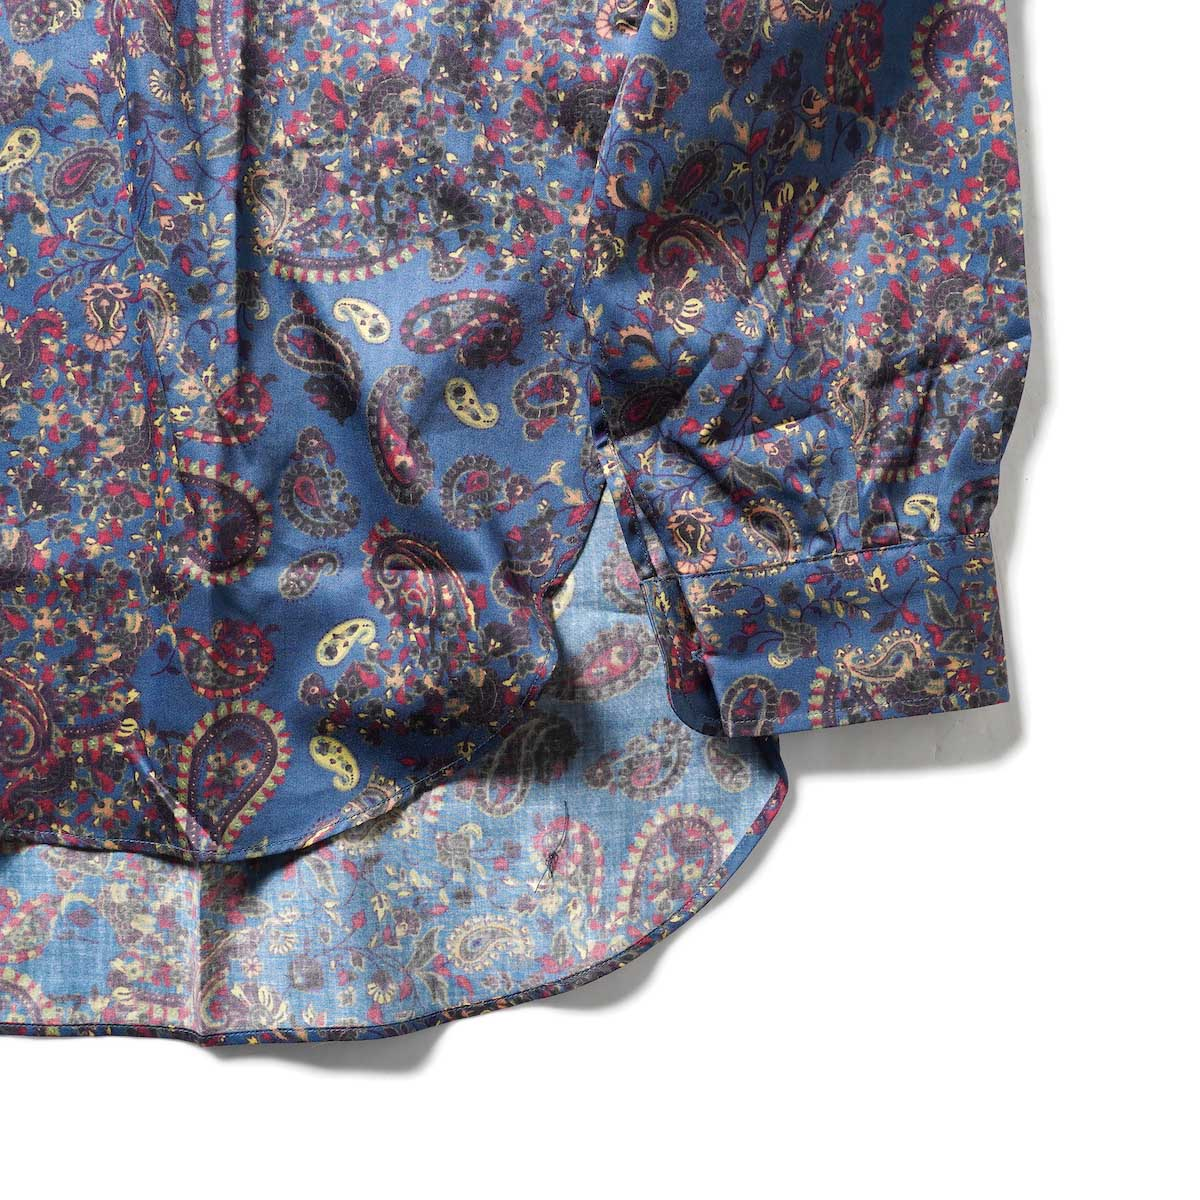 Needles / PINHOLE EDW SHIRT - COTTON SATEEN / PAISLEY PT. (Blue)袖、裾